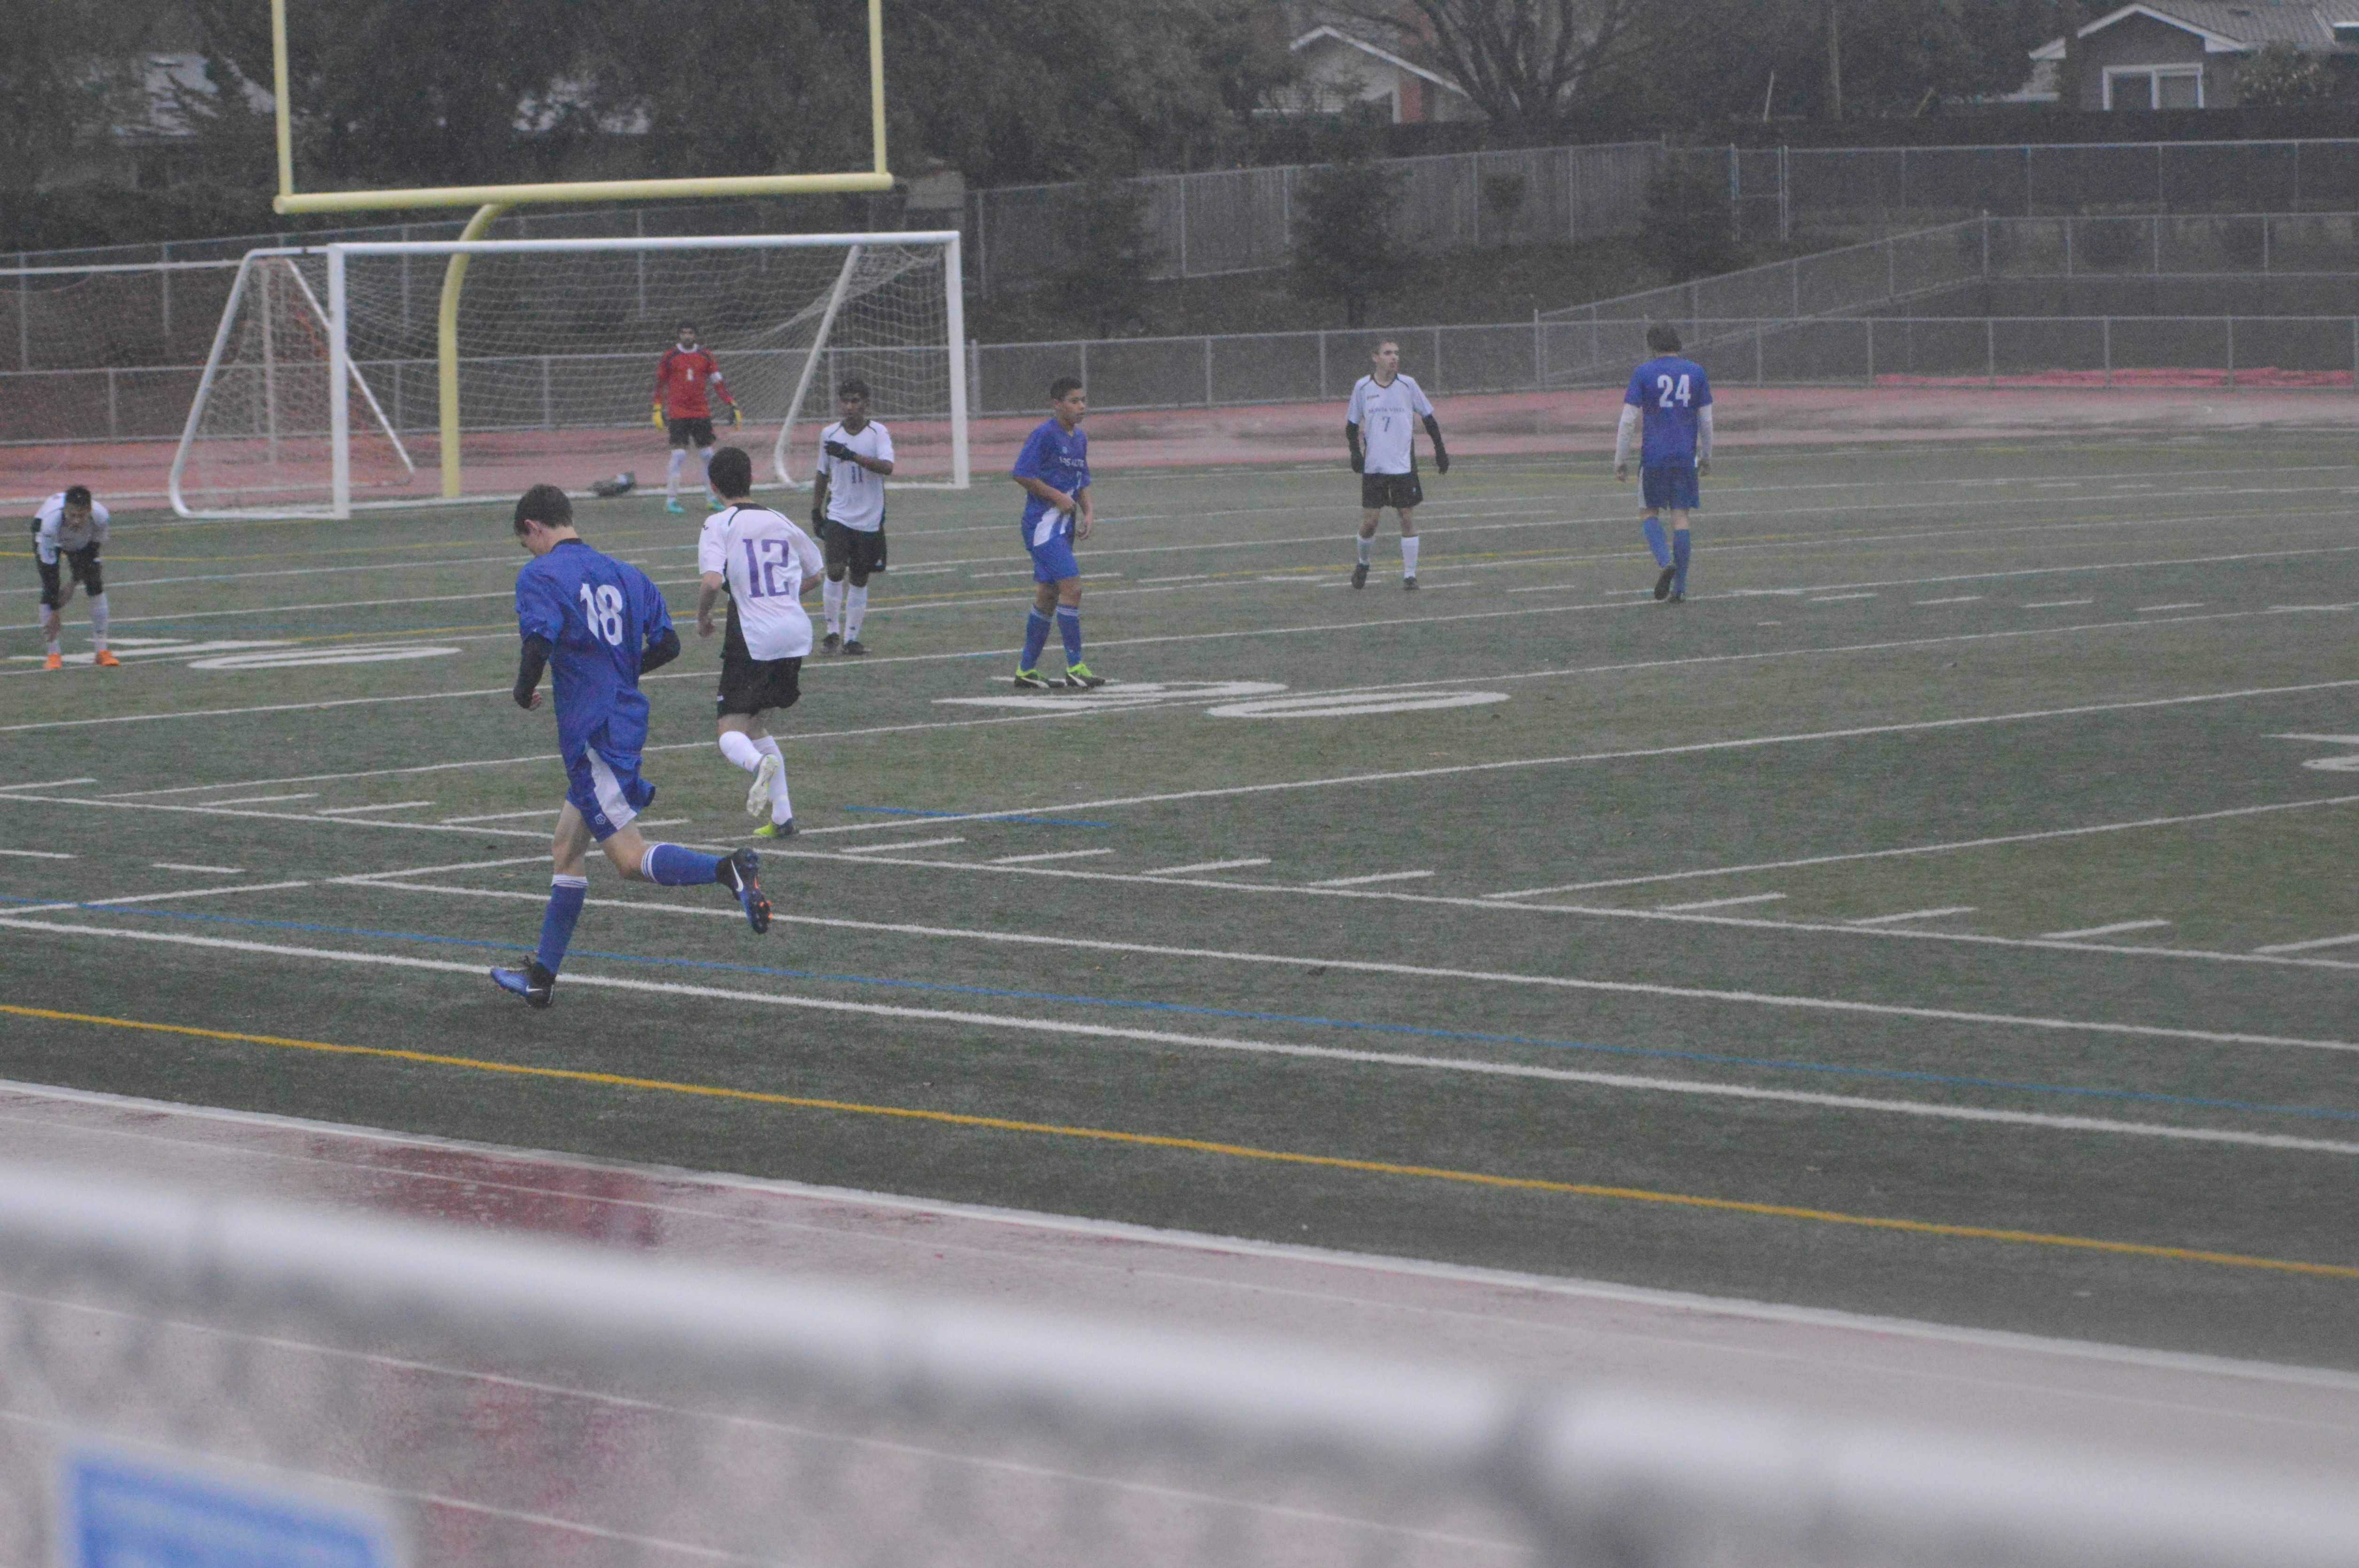 Boys soccer: Team blown out 0-3 against Los Altos HS